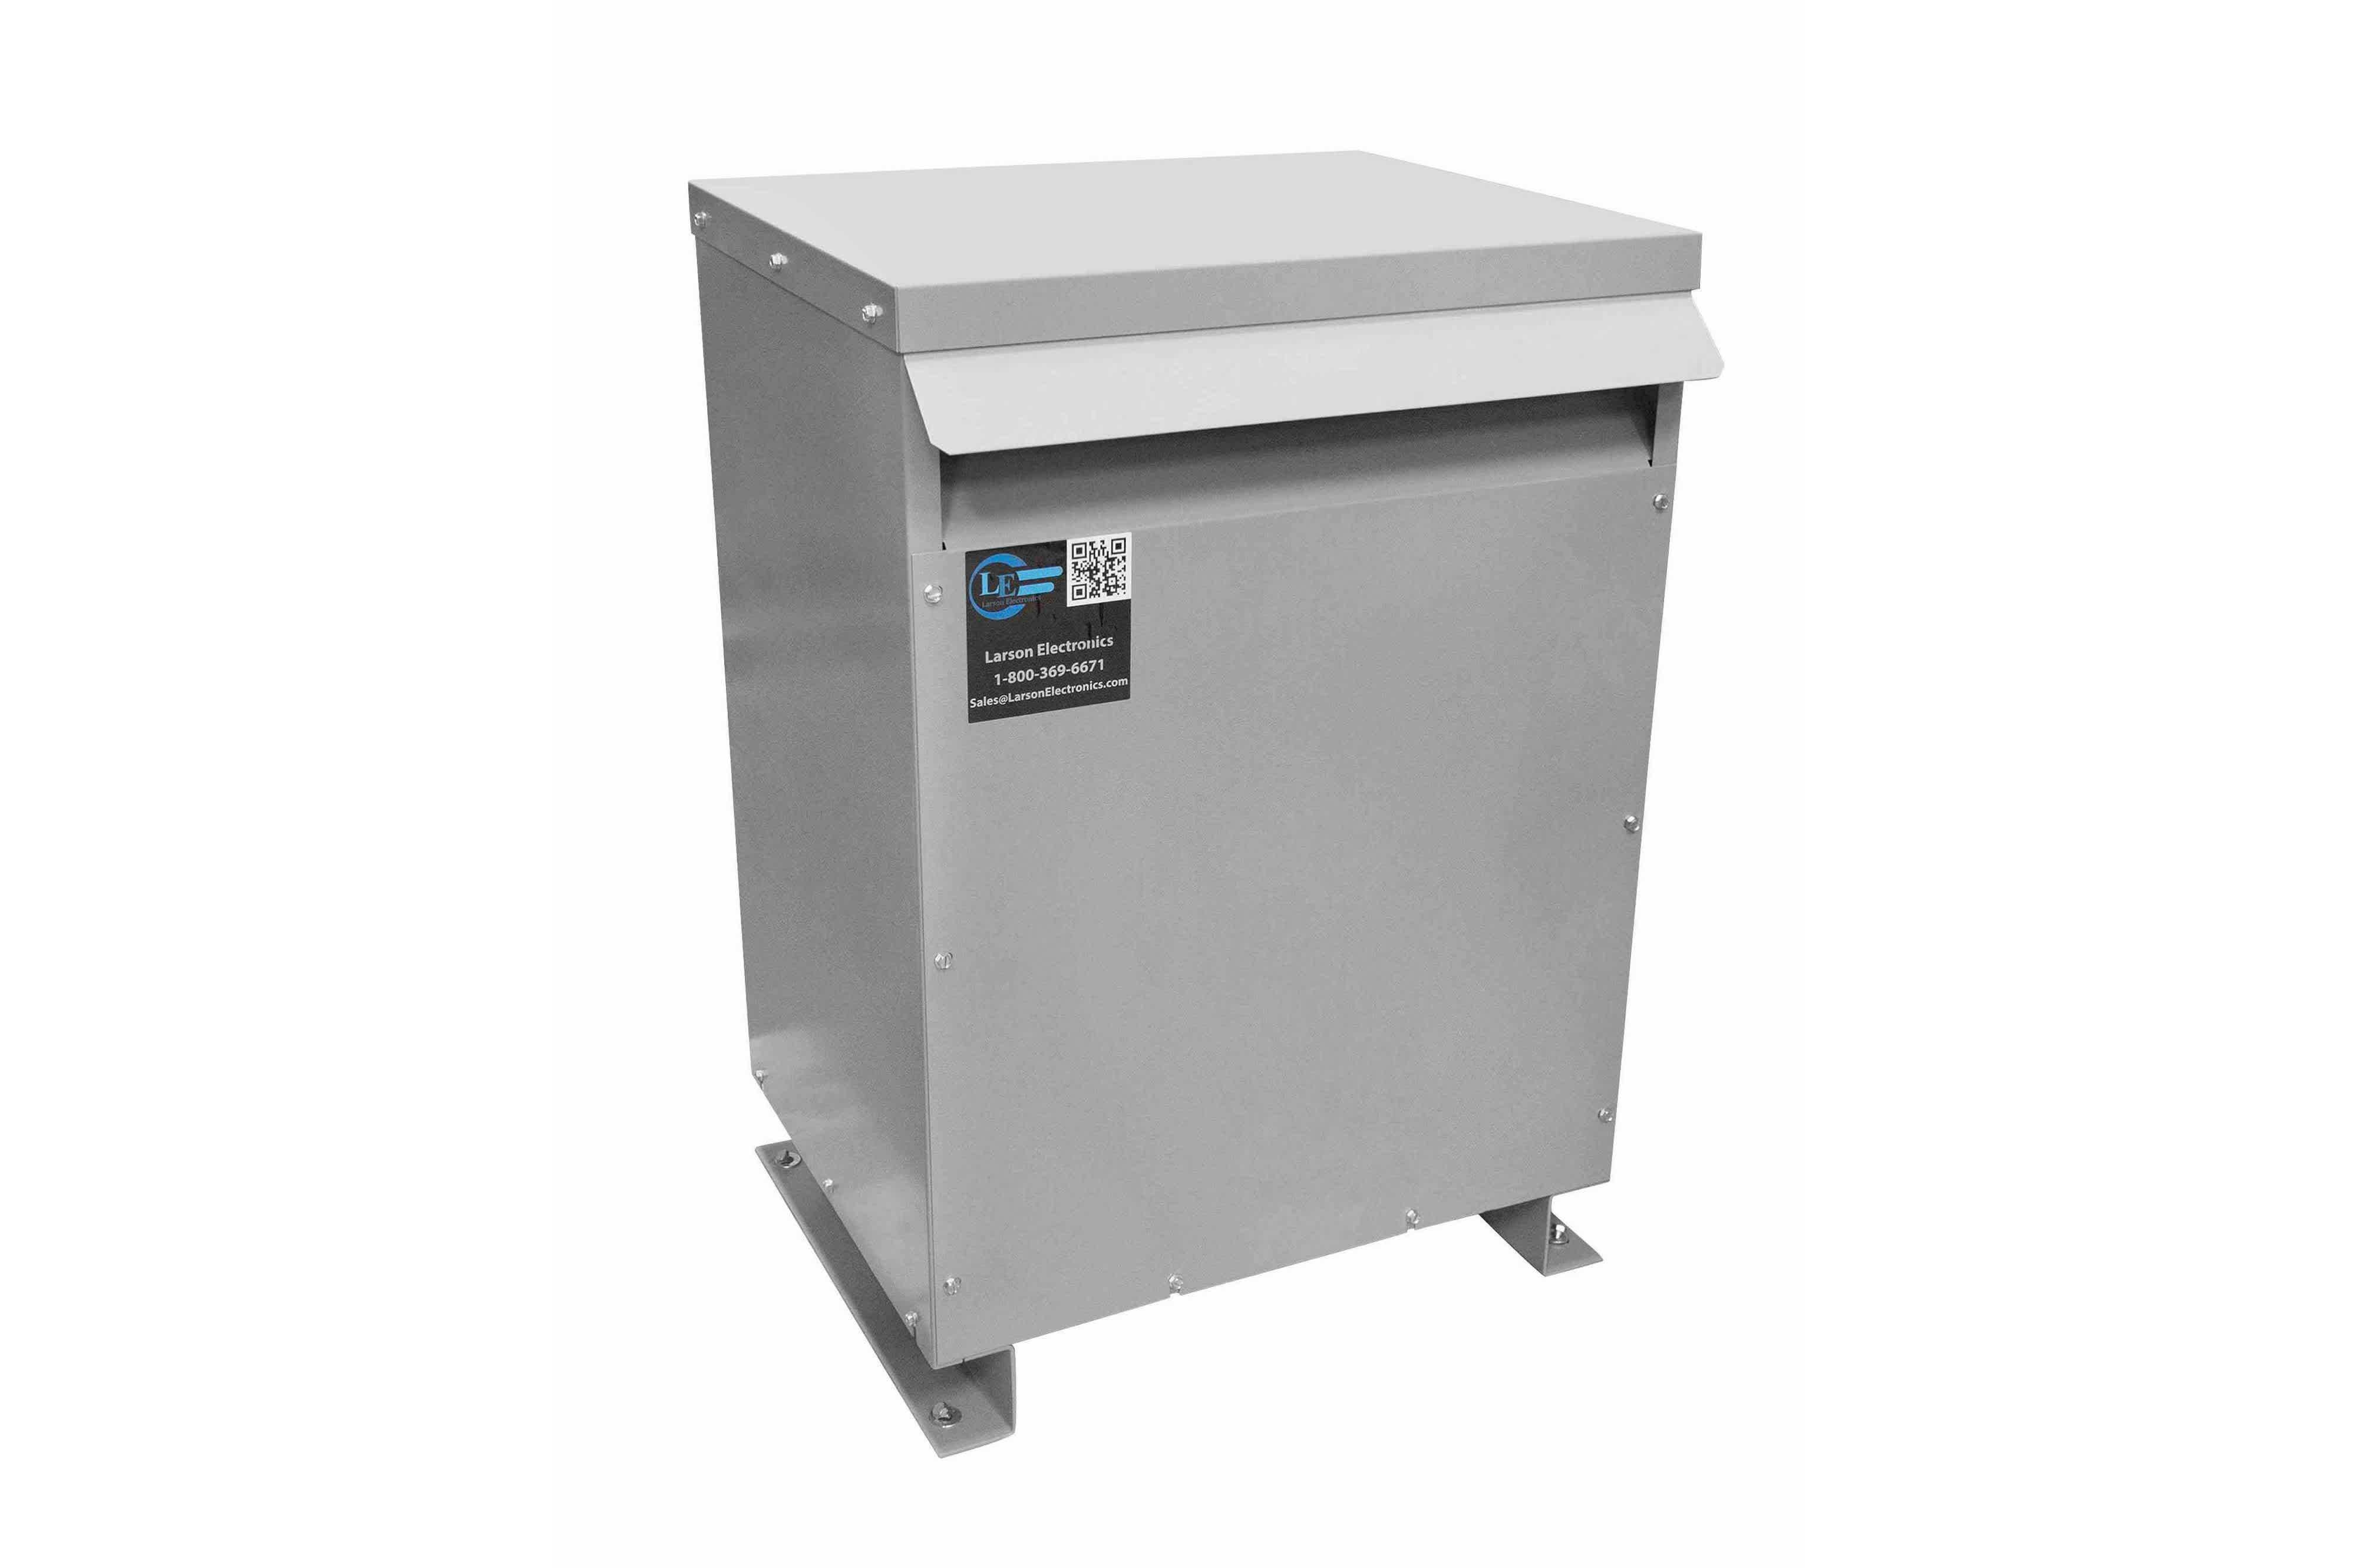 900 kVA 3PH Isolation Transformer, 460V Wye Primary, 400Y/231 Wye-N Secondary, N3R, Ventilated, 60 Hz